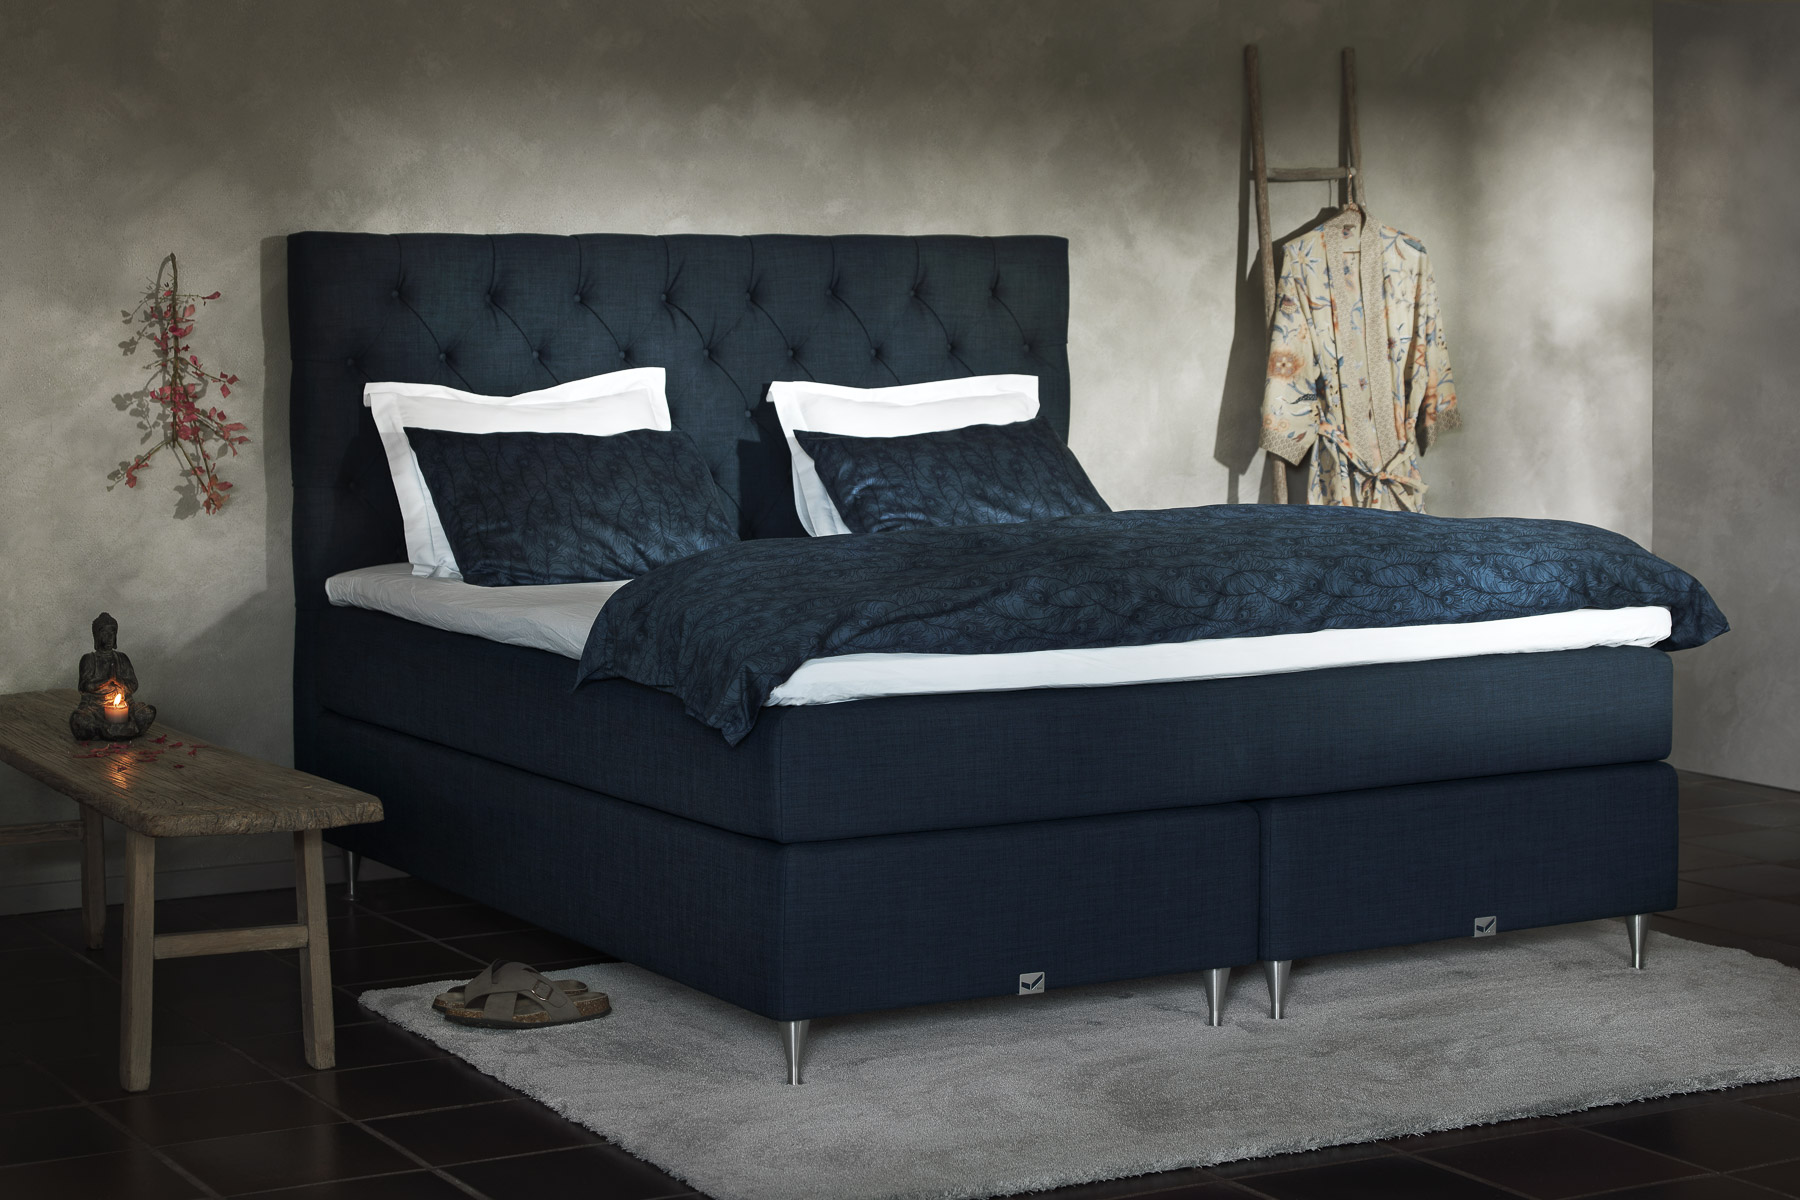 VIKING BEDS SOVA-2208